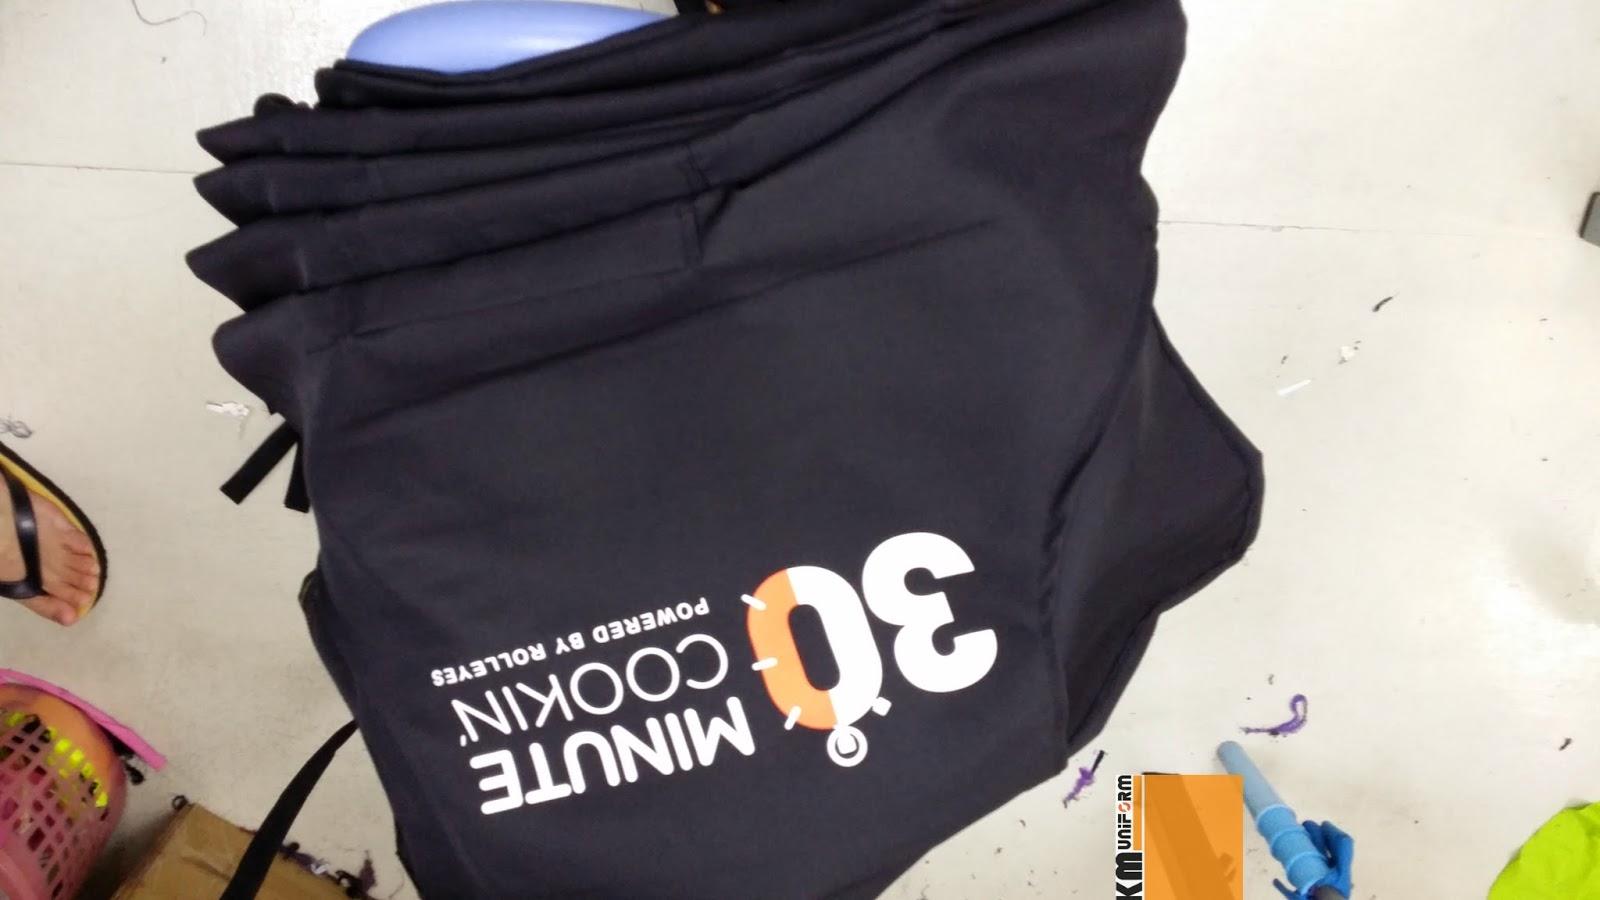 Uniform Supplier In Johor Bahru Customize T Shirt Design